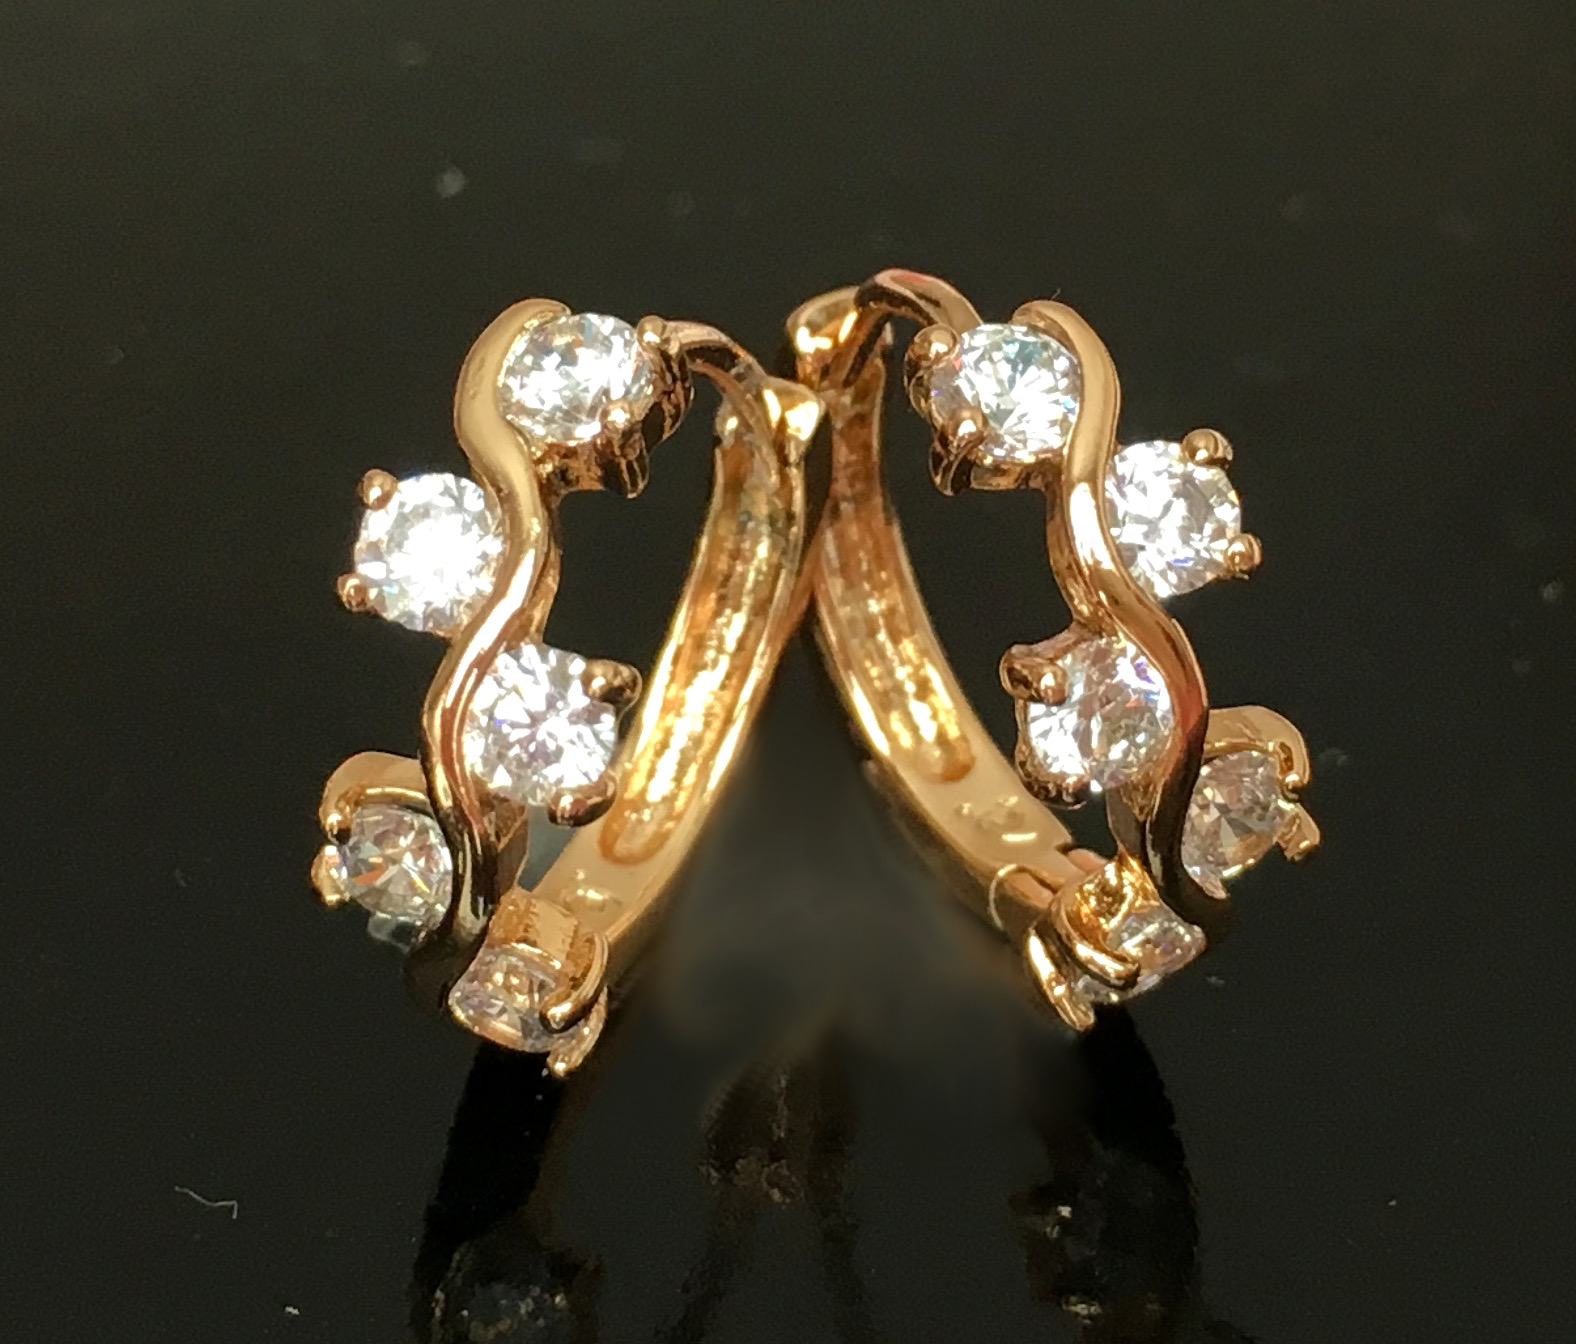 Luxus Ohrringe Creolen Zirkonia Hänger Champagner 750er Gold 18 Karat vergoldet